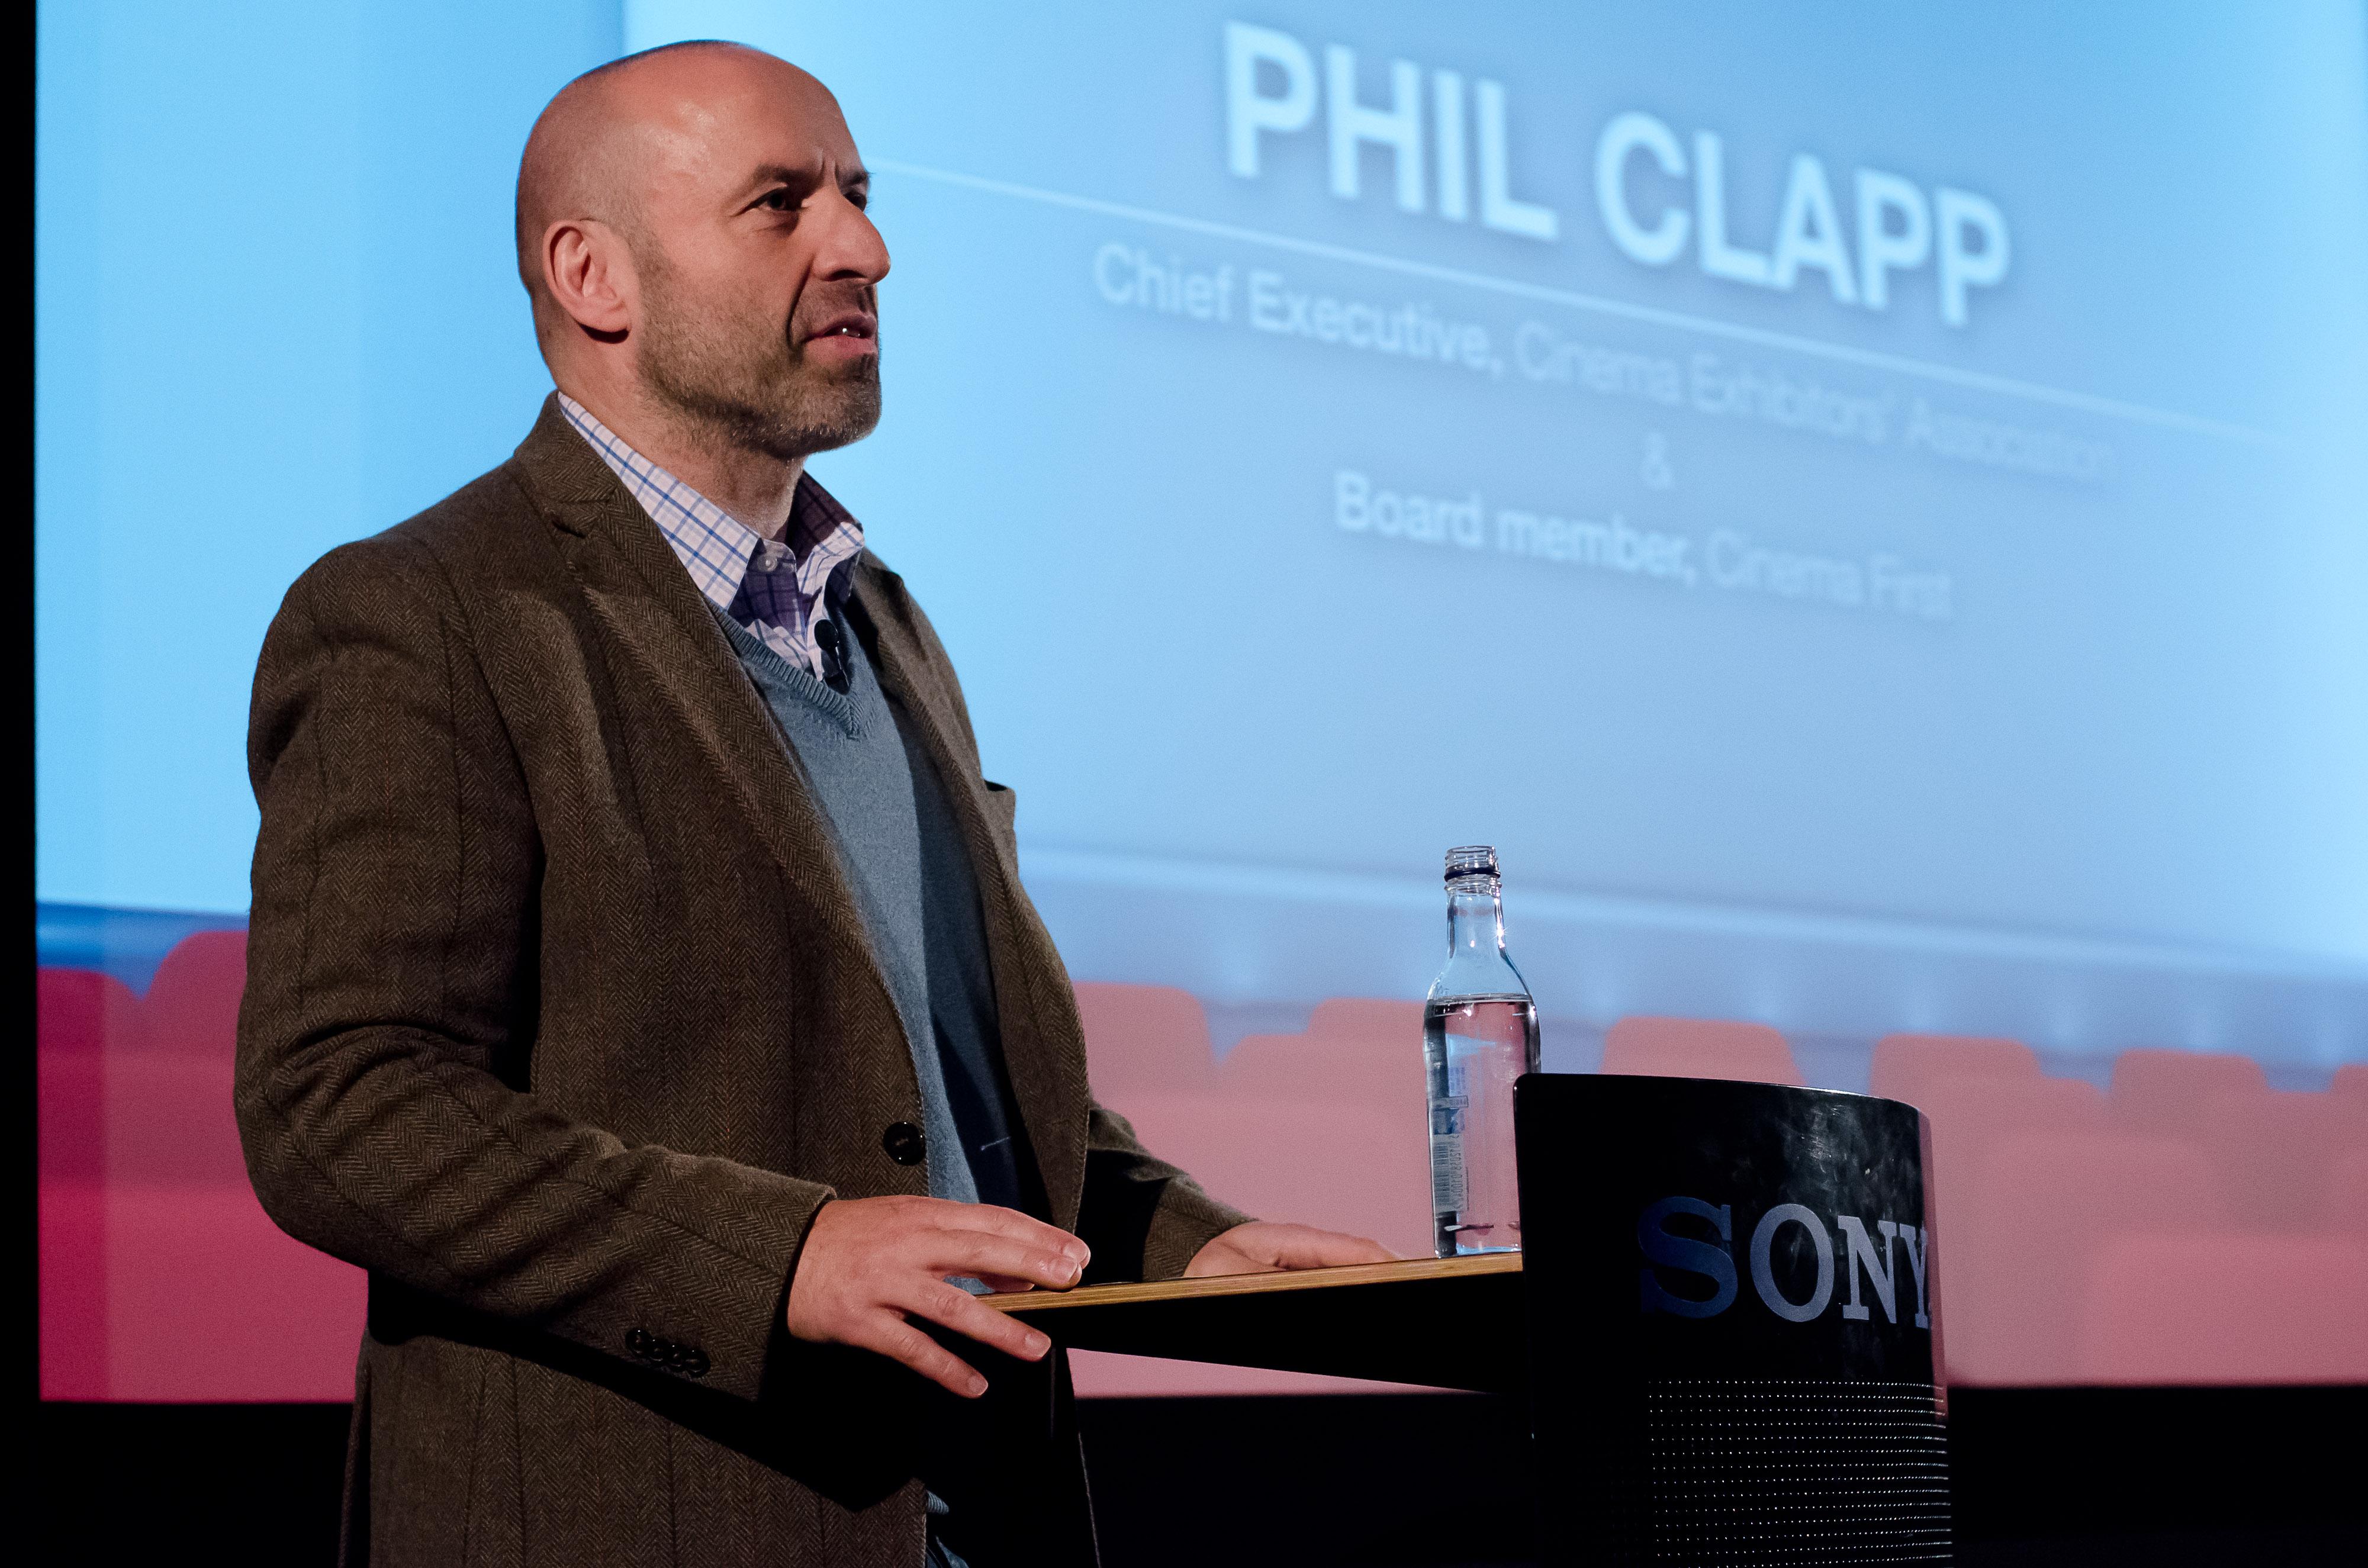 Phil_Clapp_H_S_4.jpg